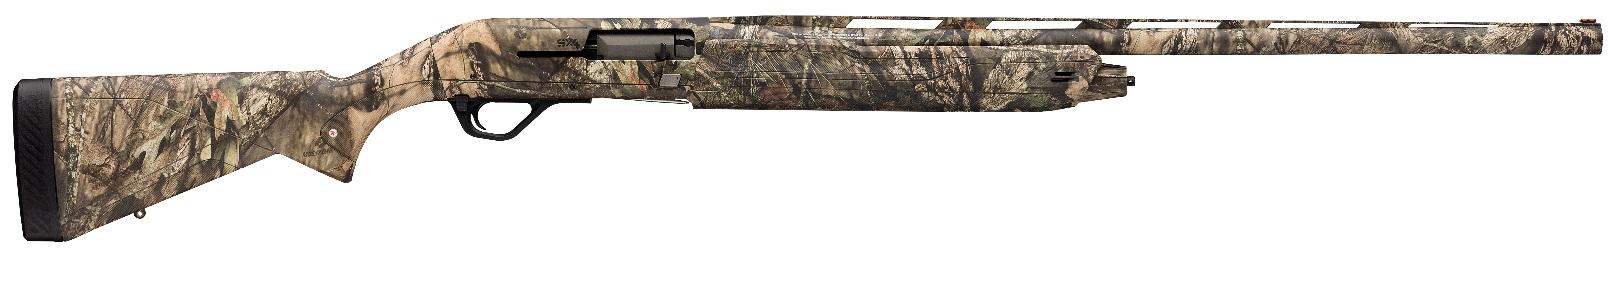 Winchester SX4 Universal Hunter 12 Gauge